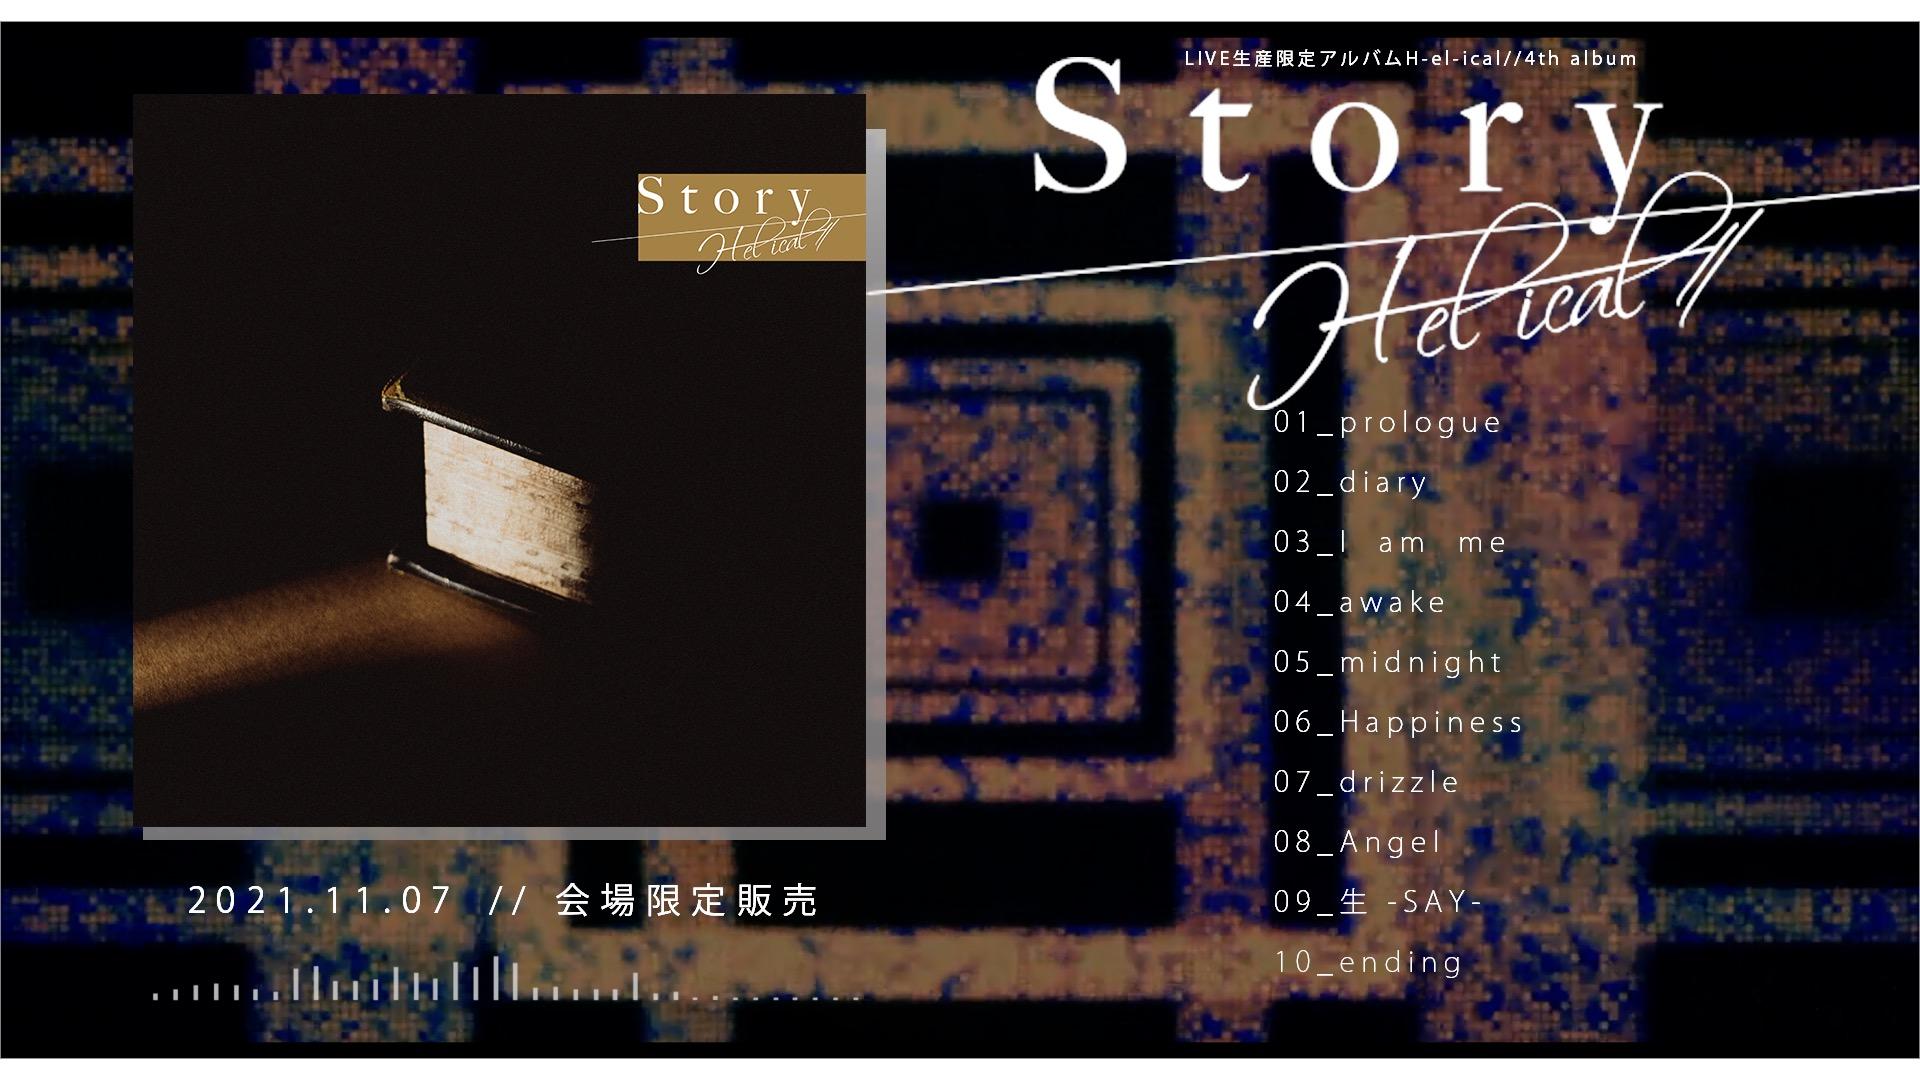 LIVE生産限定アルバムH-el-ical//4th album「Story」発売決定!